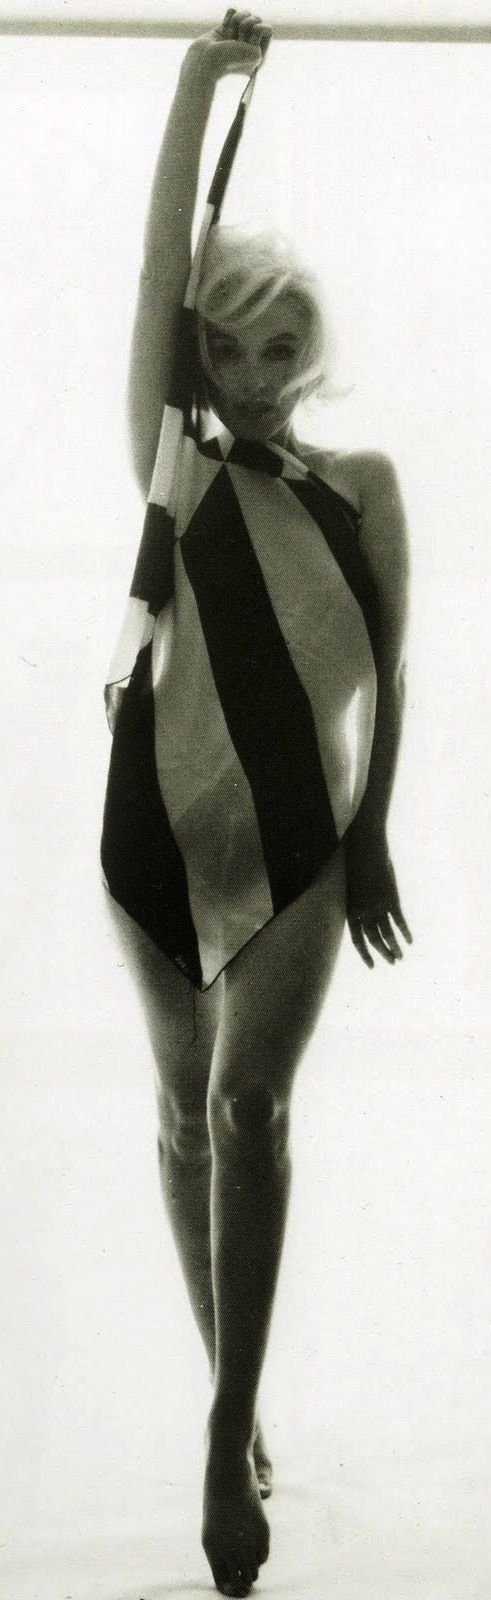 Marilyn Monroe by Bert Stern for Vogue, June 1962—The Last Sitting